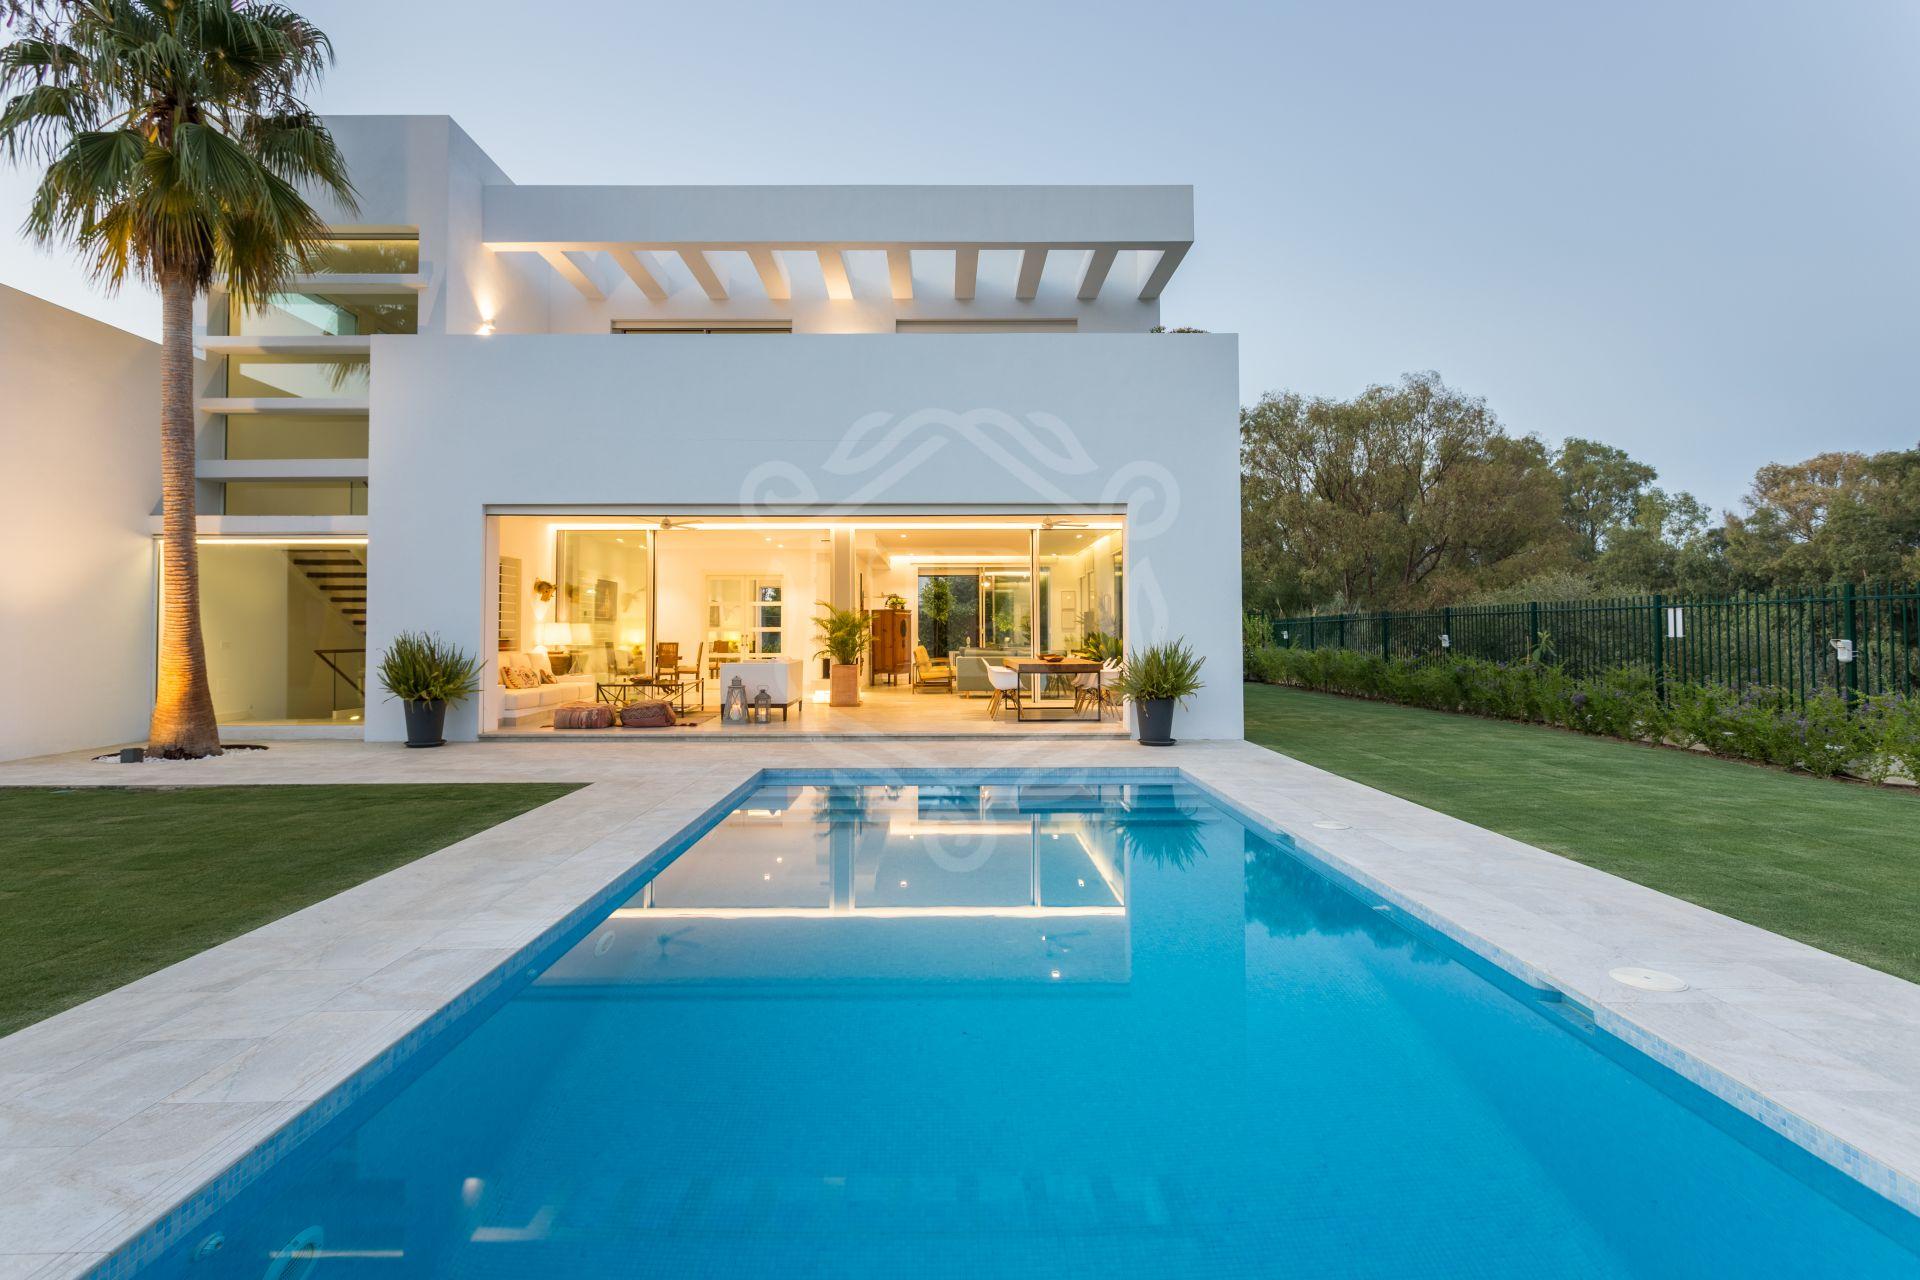 Modern villa short walk from the beach in Casasola, Estepona - Guadalmina Baja